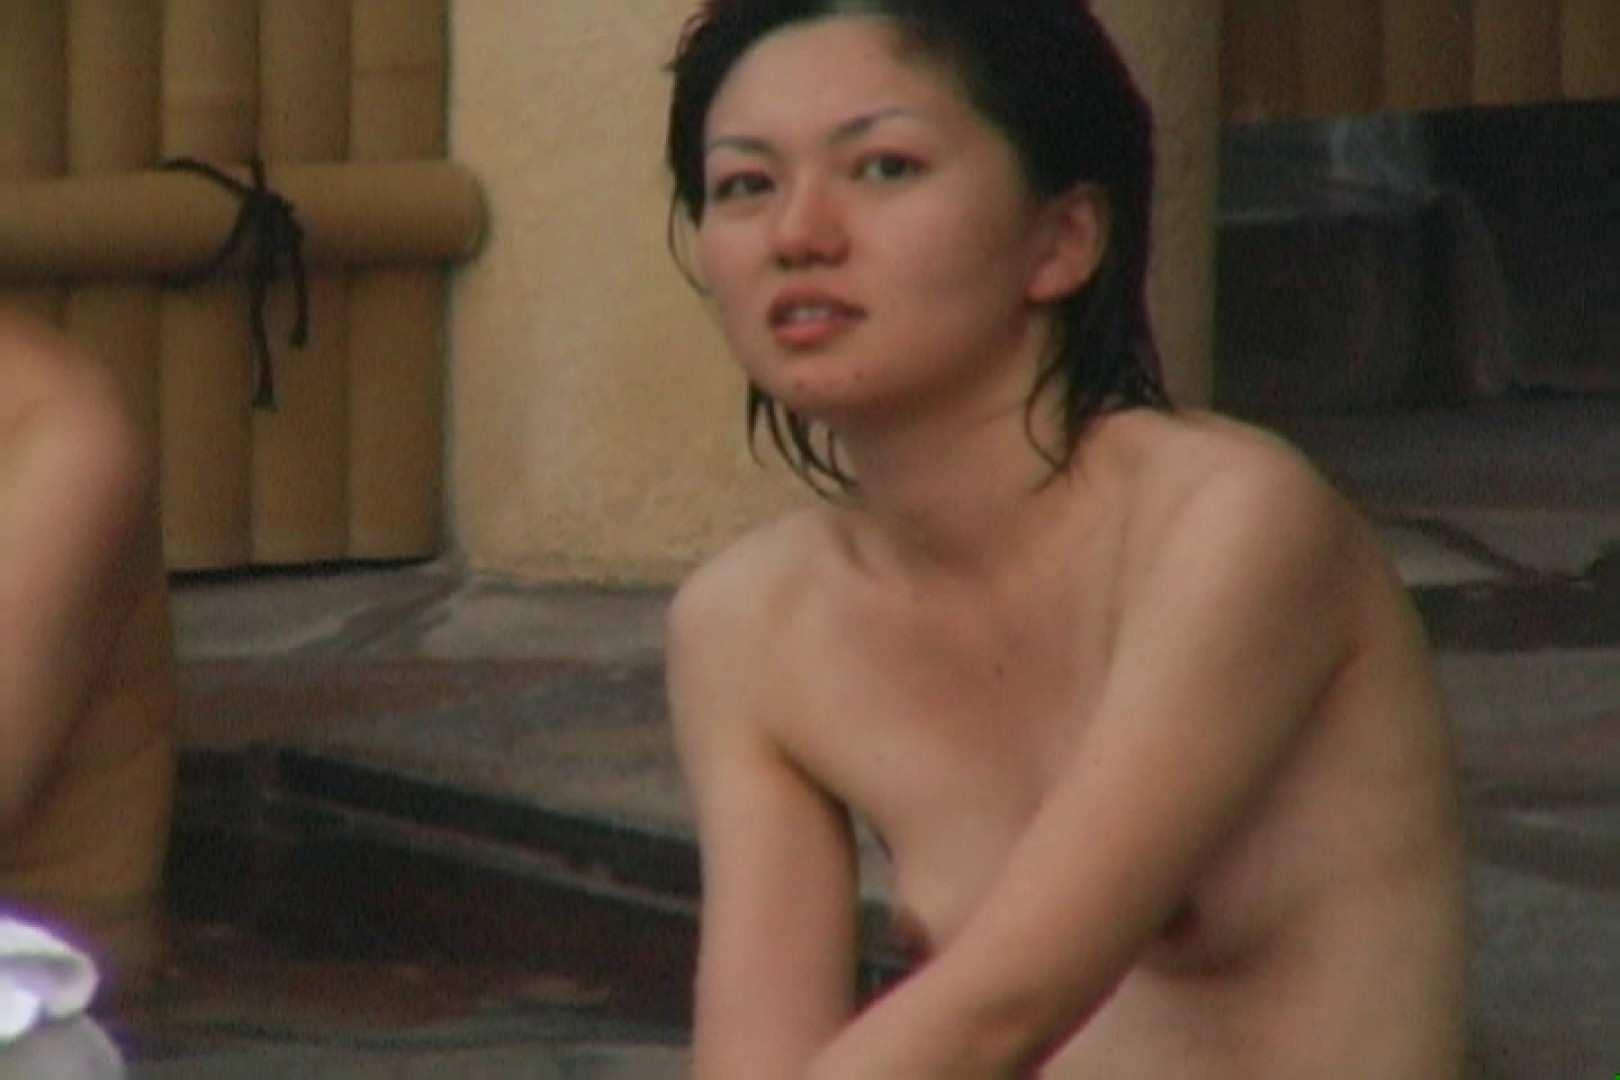 Aquaな露天風呂Vol.613 盗撮師作品 | 露天風呂突入  103pic 19